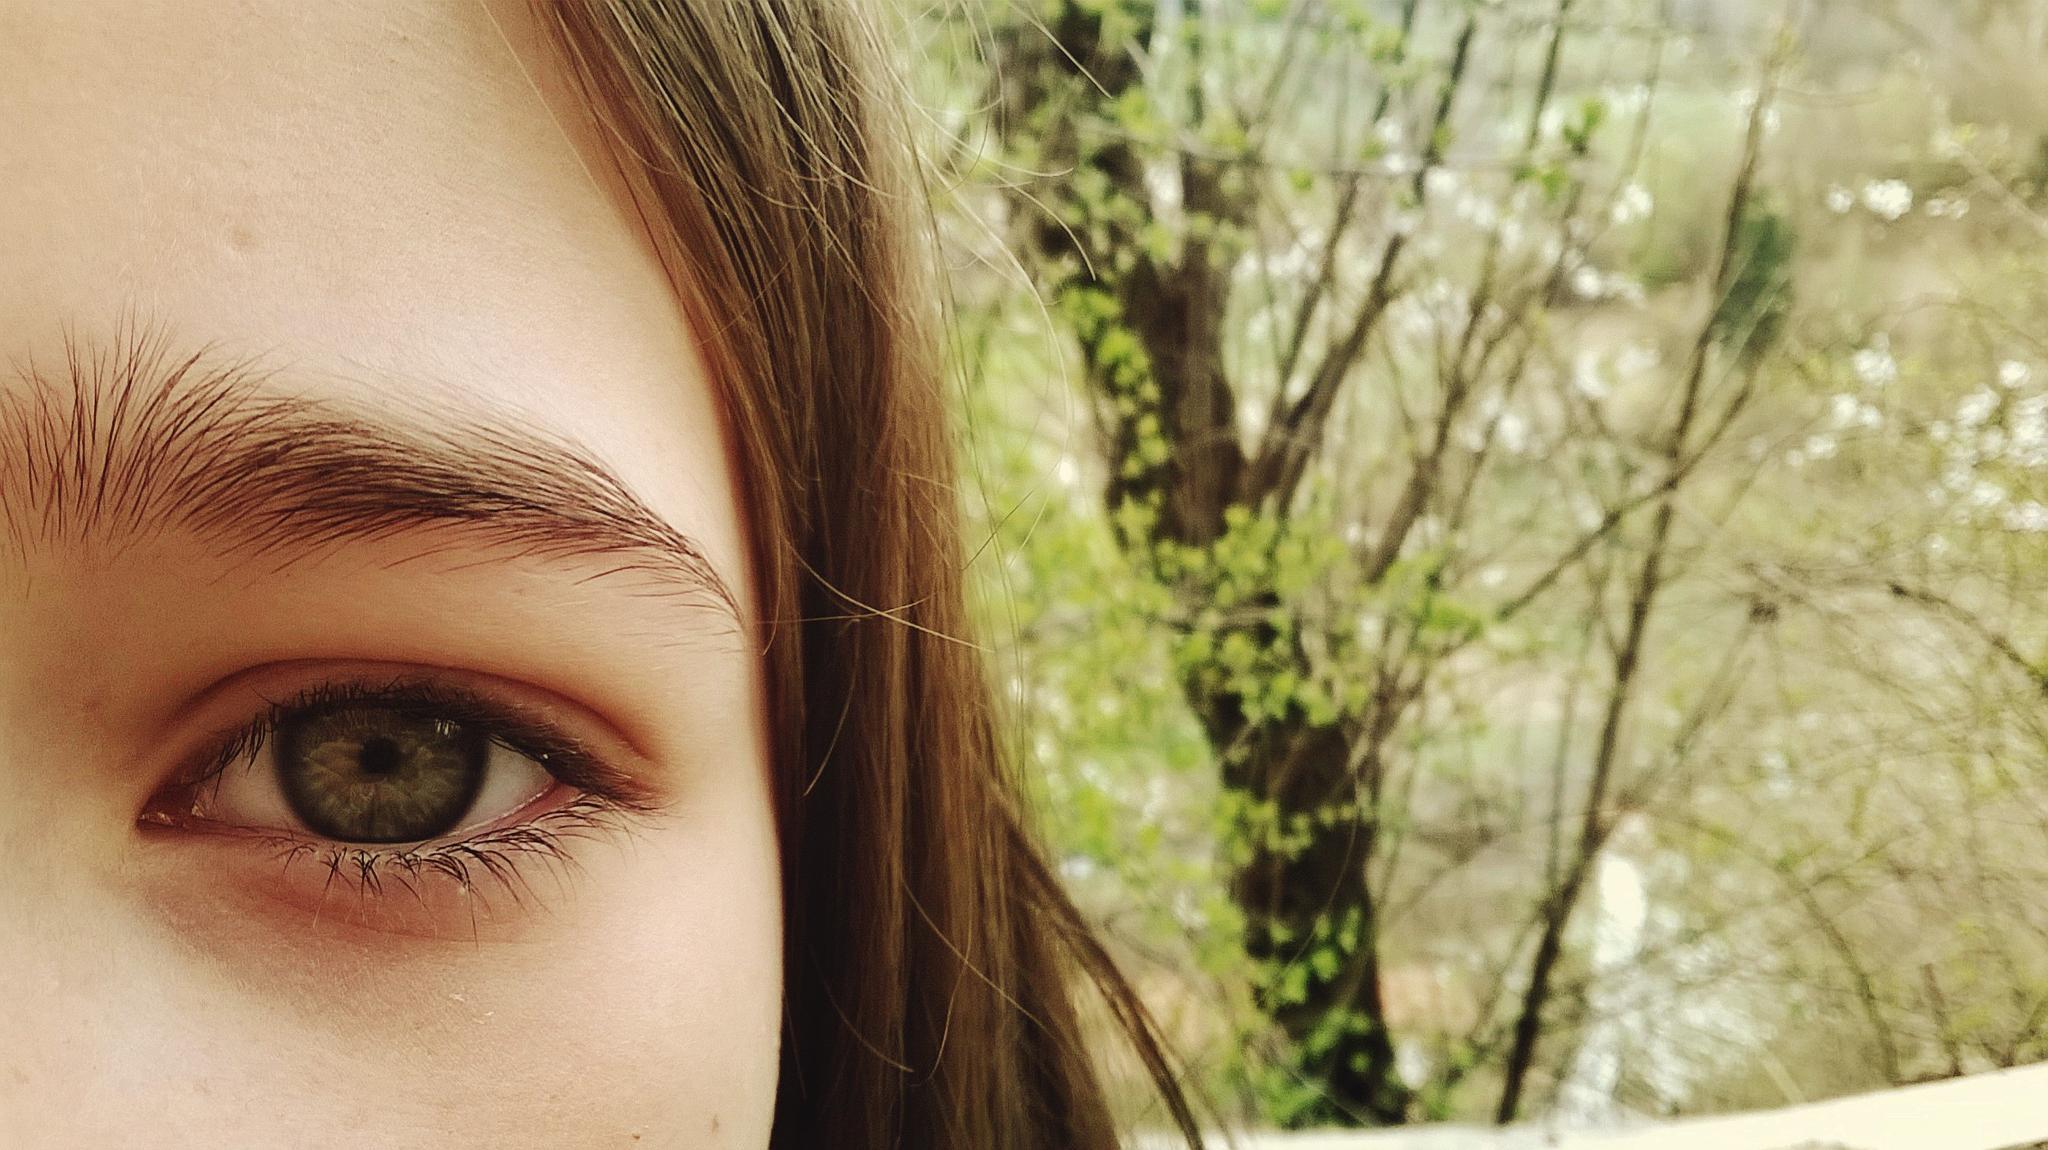 in the eyes of a child by Krasi Asenov